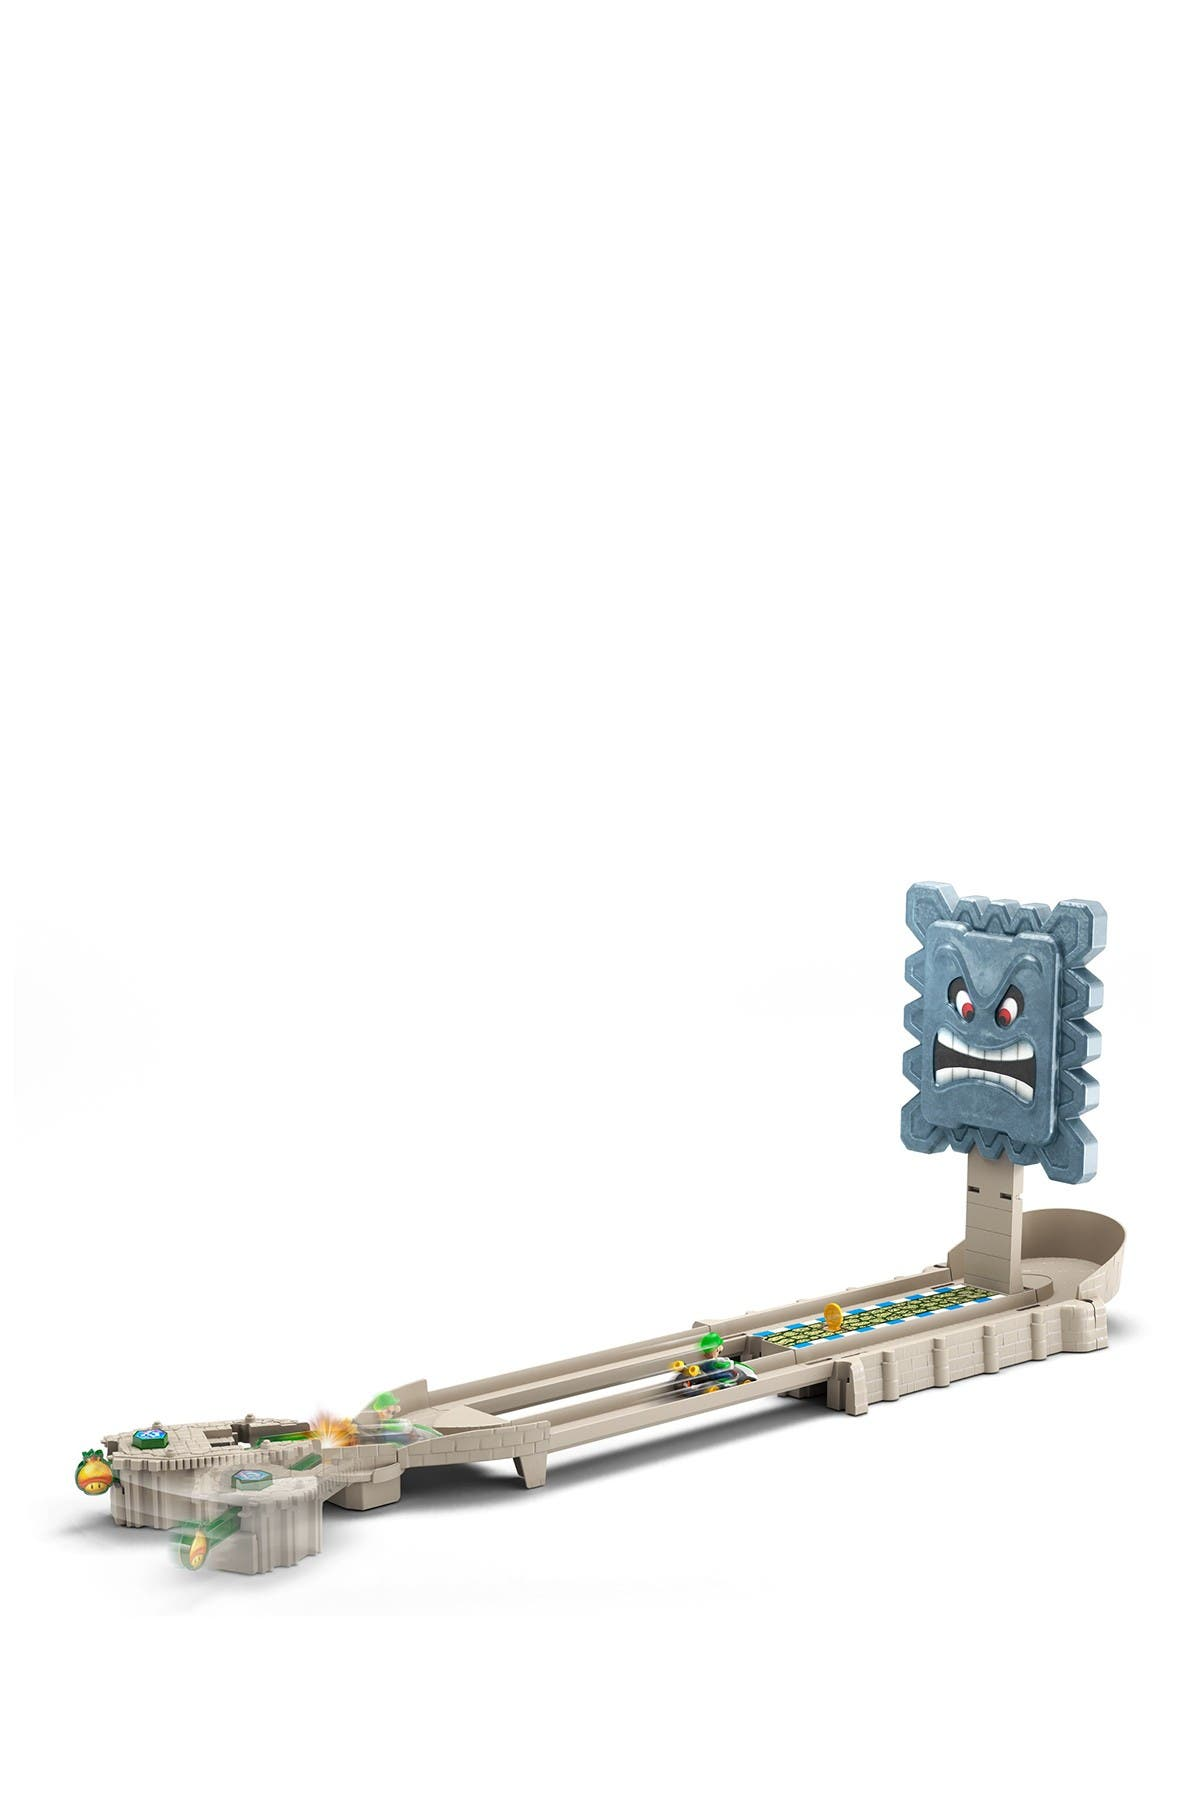 Image of Mattel Hot Wheels(R) Mario Kart(TM) Thwomp Ruins Track Set